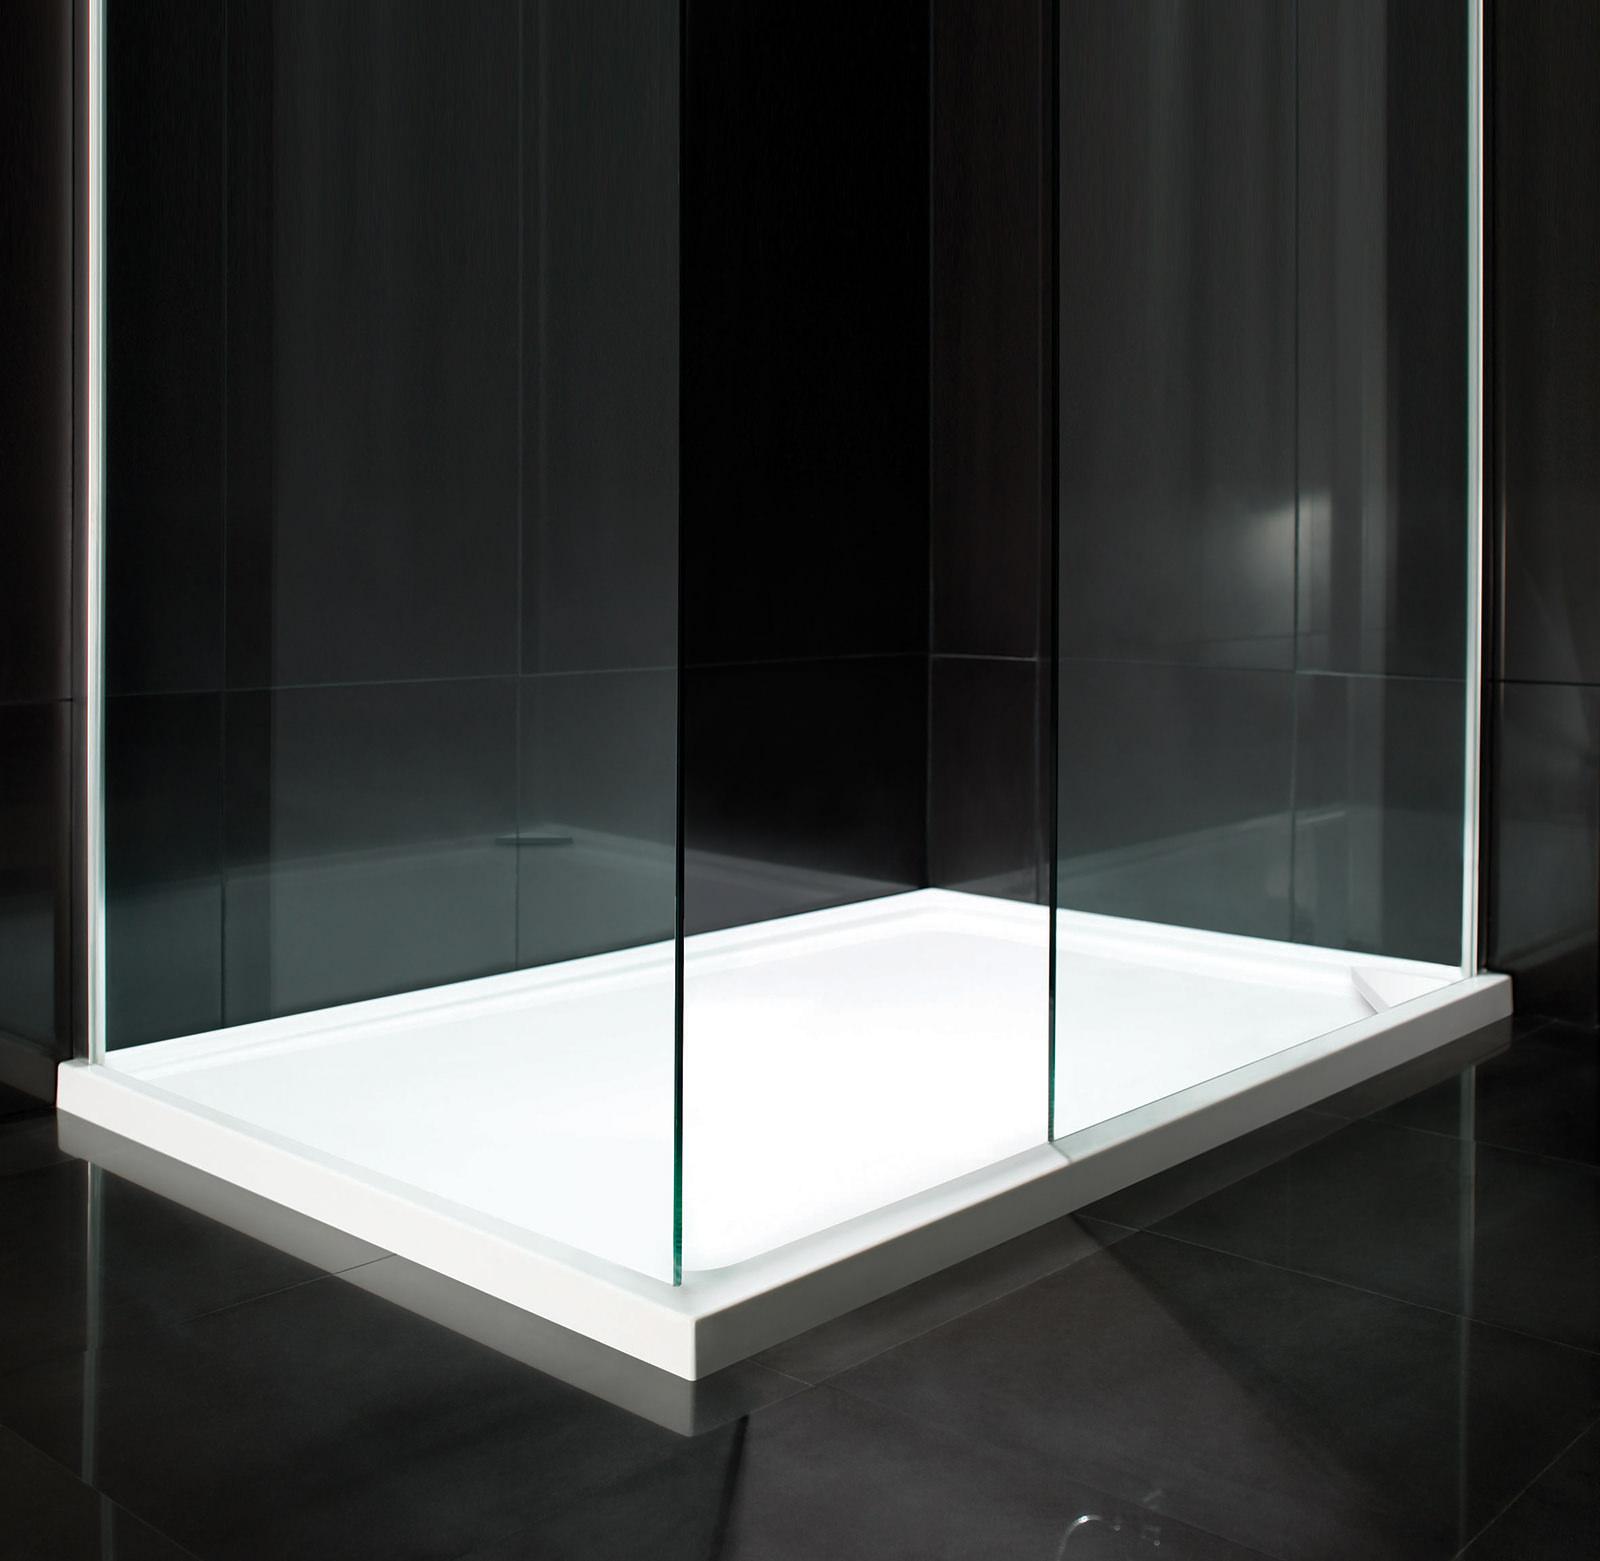 aquadart rectangular shower tray 900 x 800mm aq2503. Black Bedroom Furniture Sets. Home Design Ideas